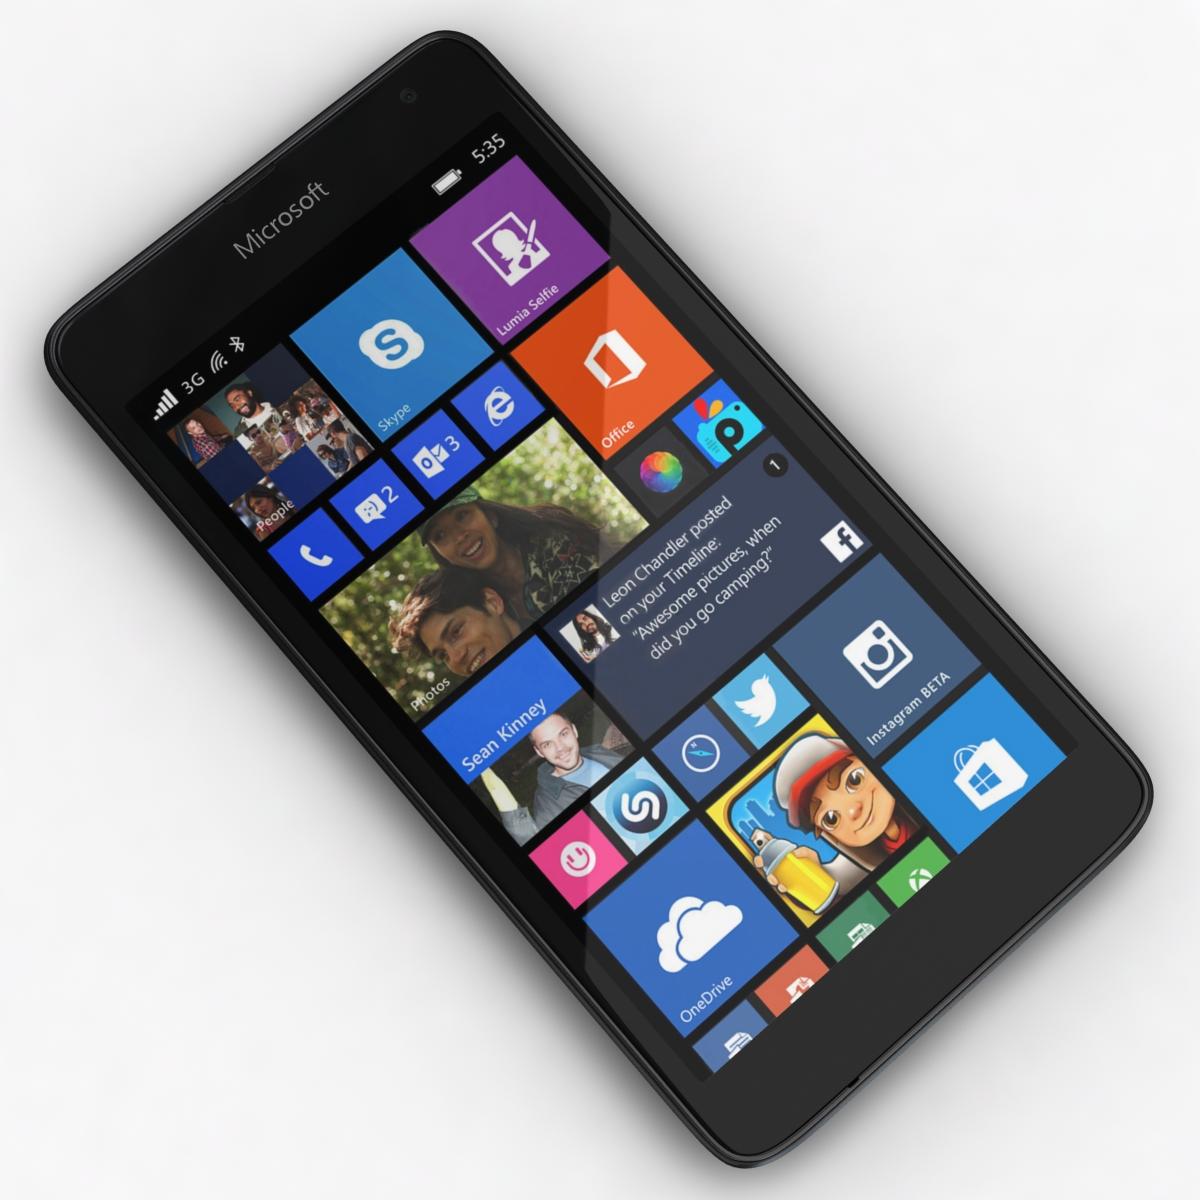 microsoft lumia 535 and dual sim black 3d model 3ds max fbx c4d obj 204352